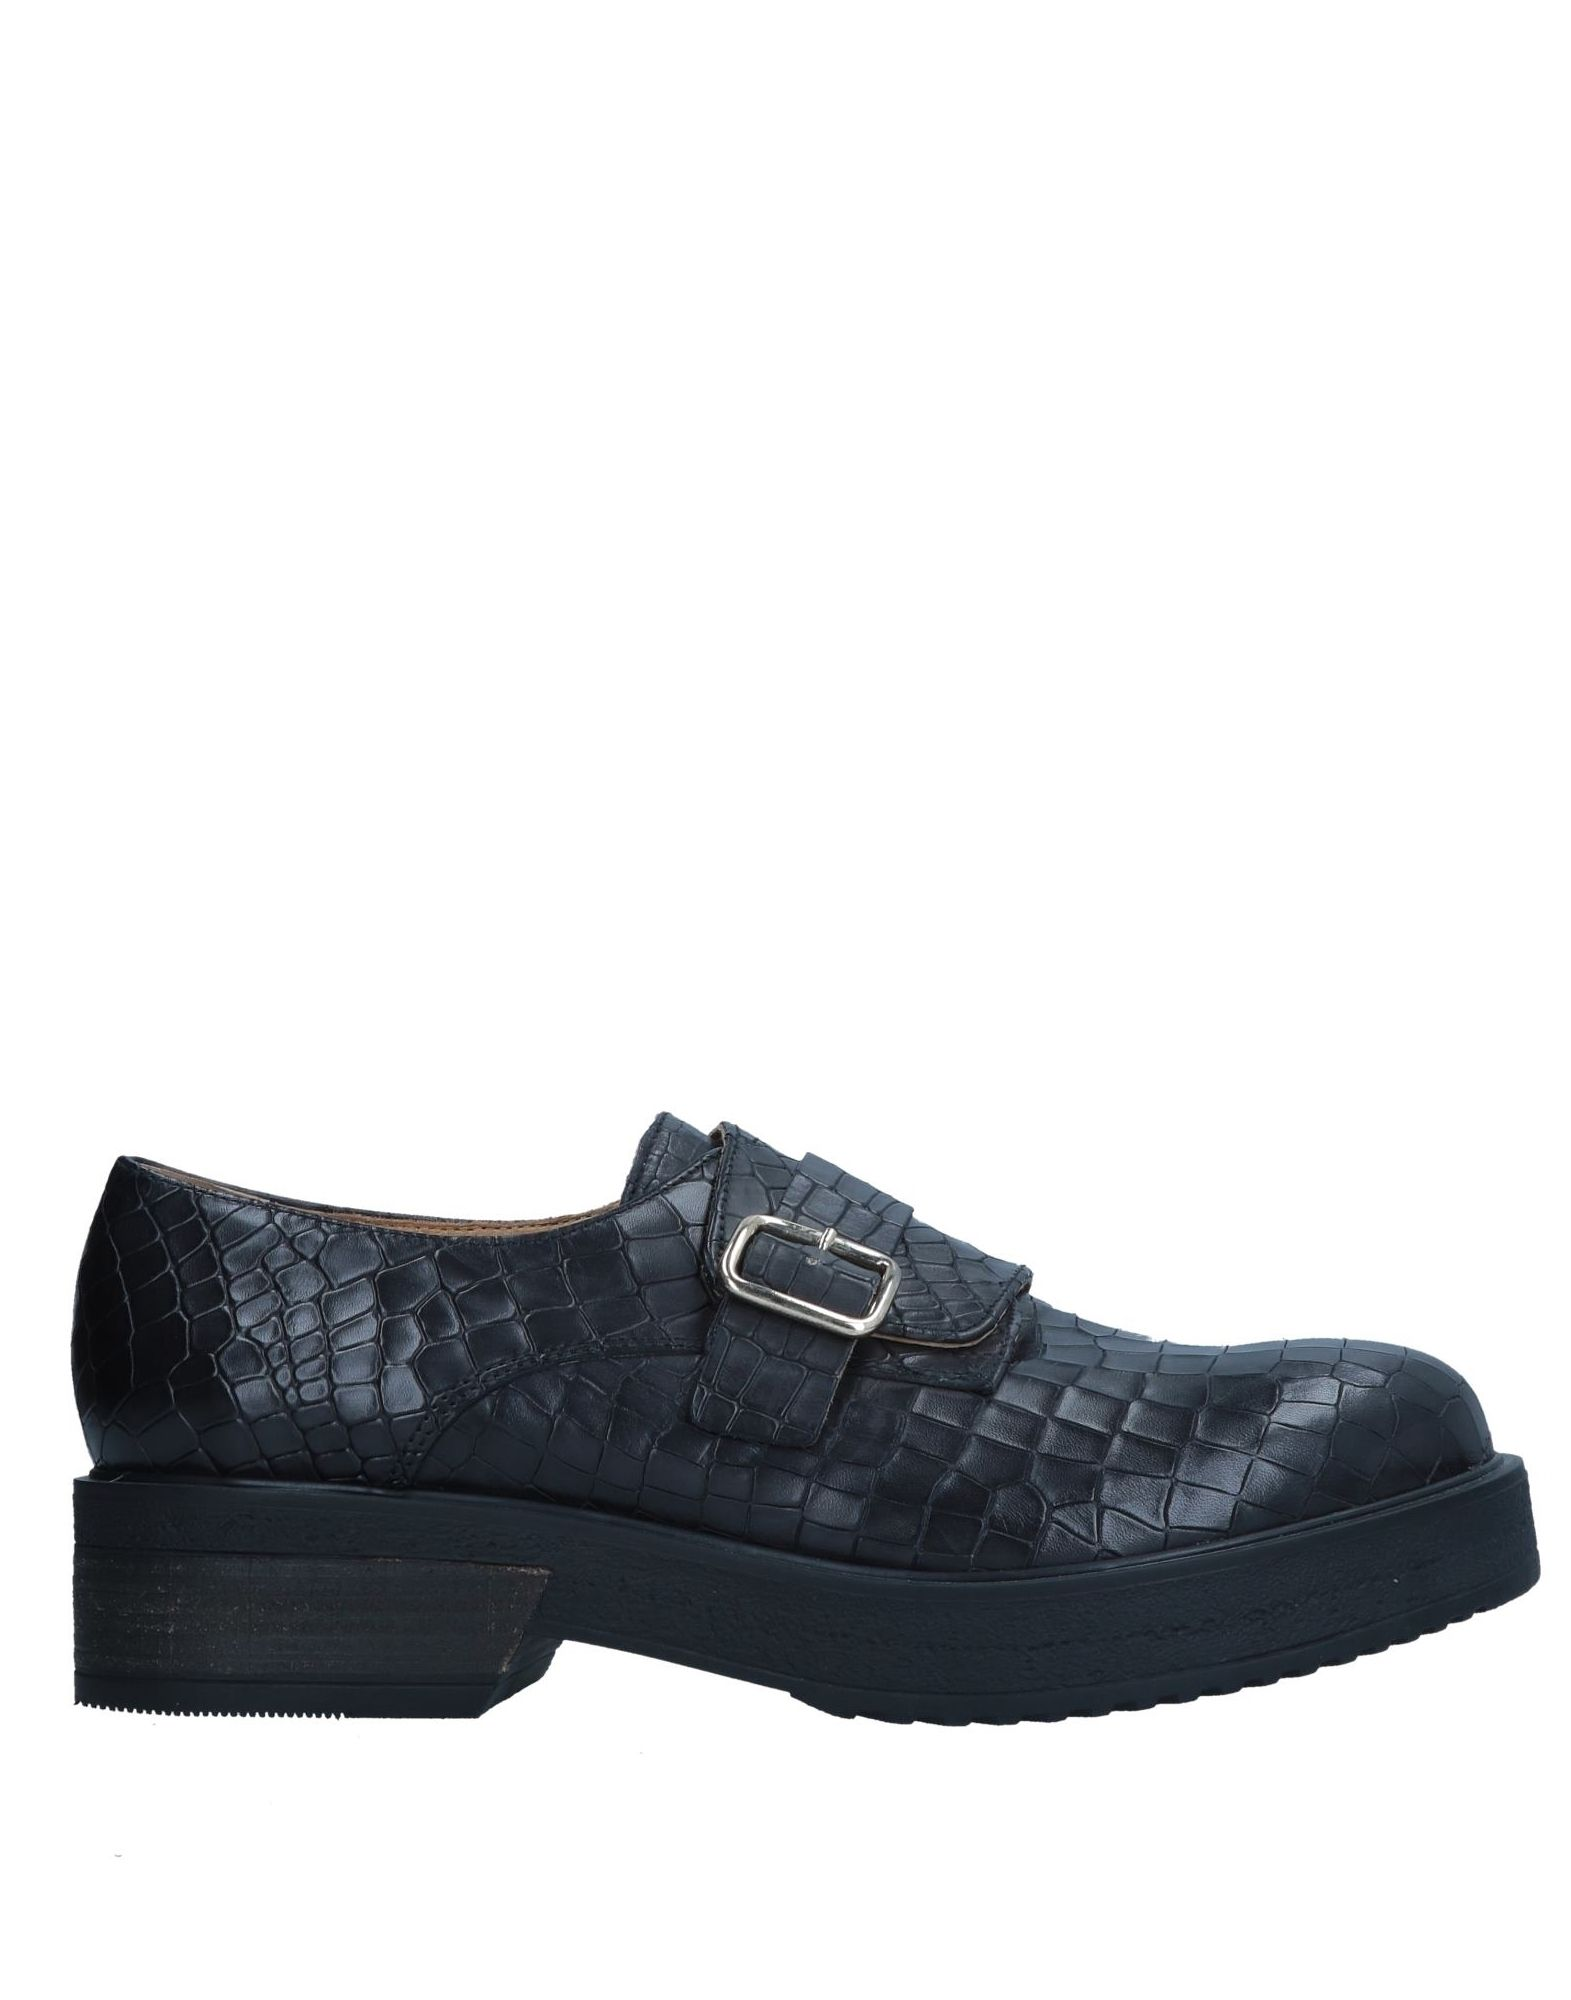 Sneakers Valsport Donna - 11465856OF comode Nuove offerte e scarpe comode 11465856OF d9fafe